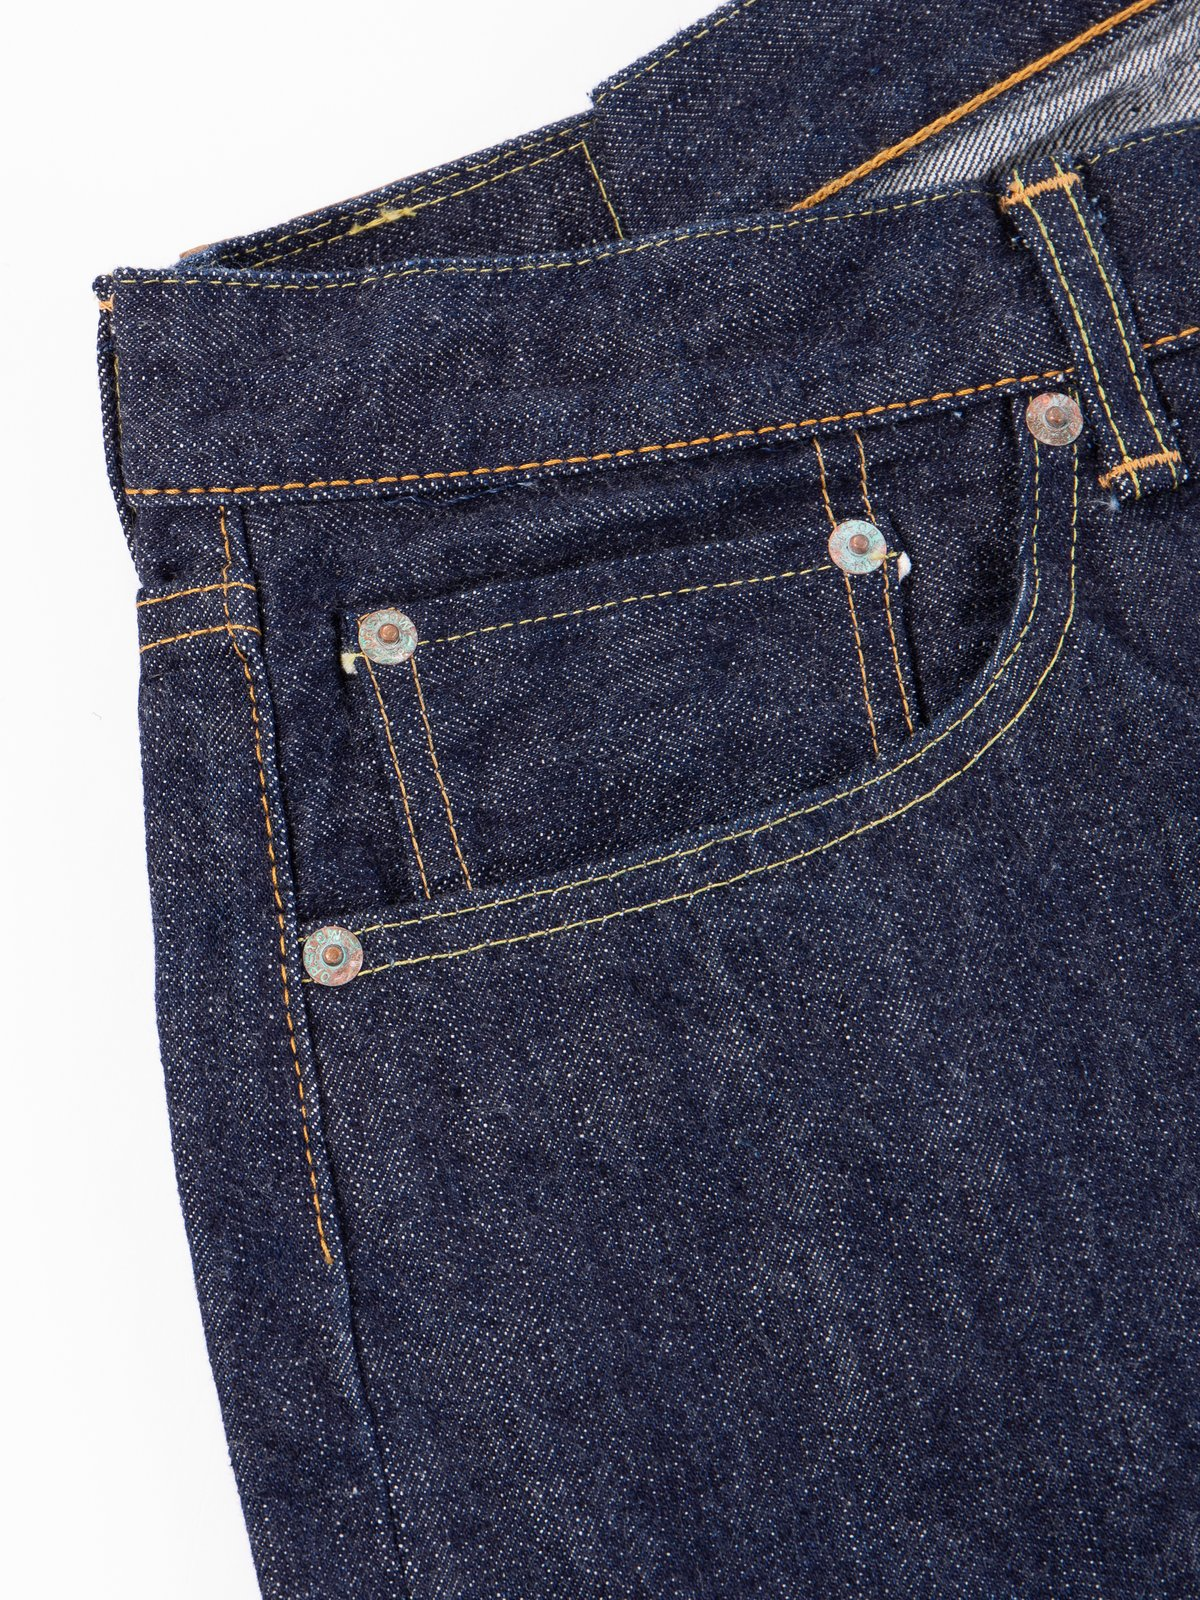 Indigo One Wash 105 Standard 5 Pocket Jean - Image 6